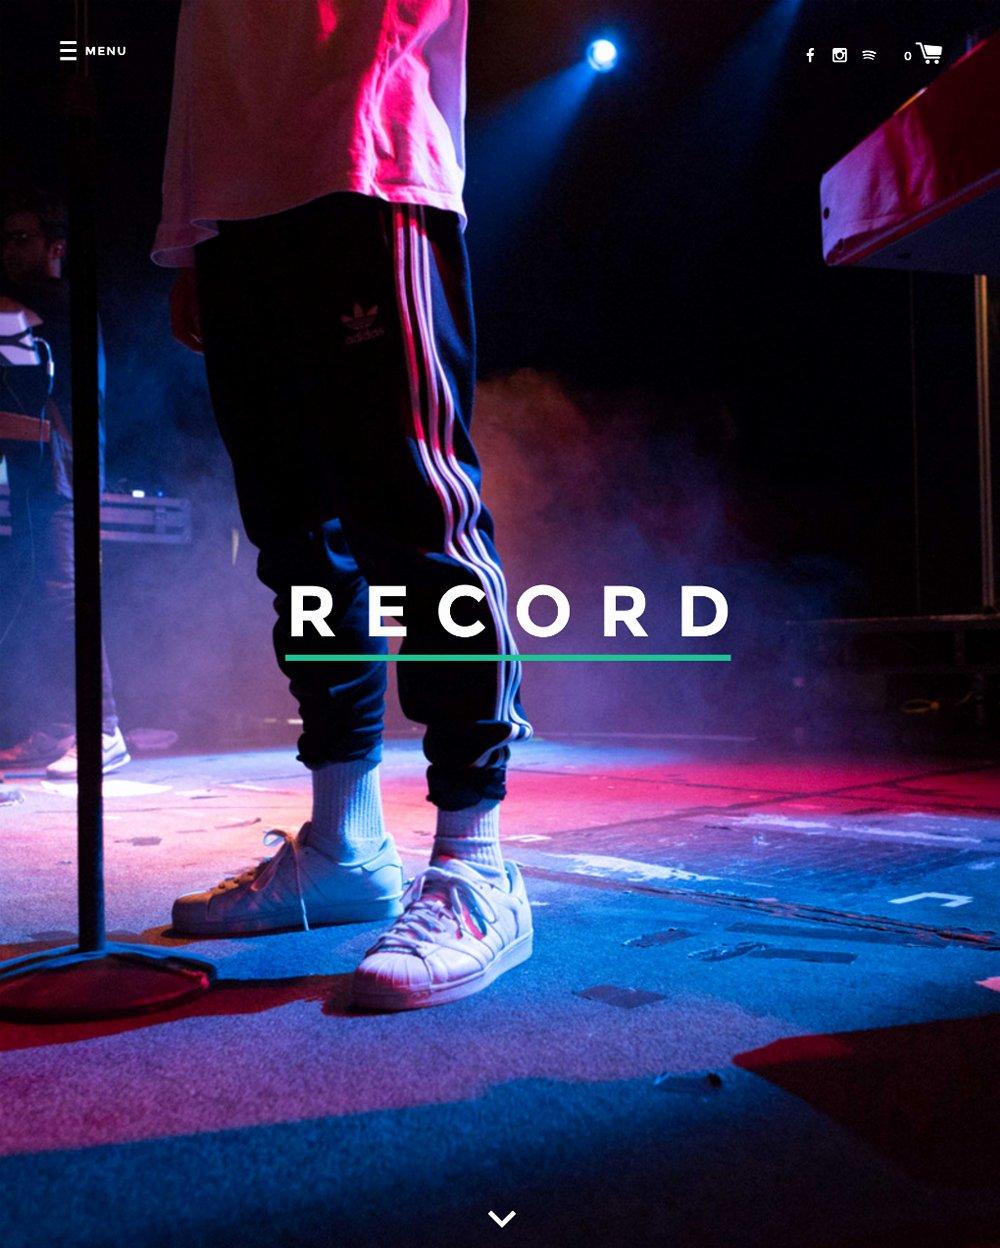 Record Label Web Template Beautiful Record theme Label E Merce Website Template